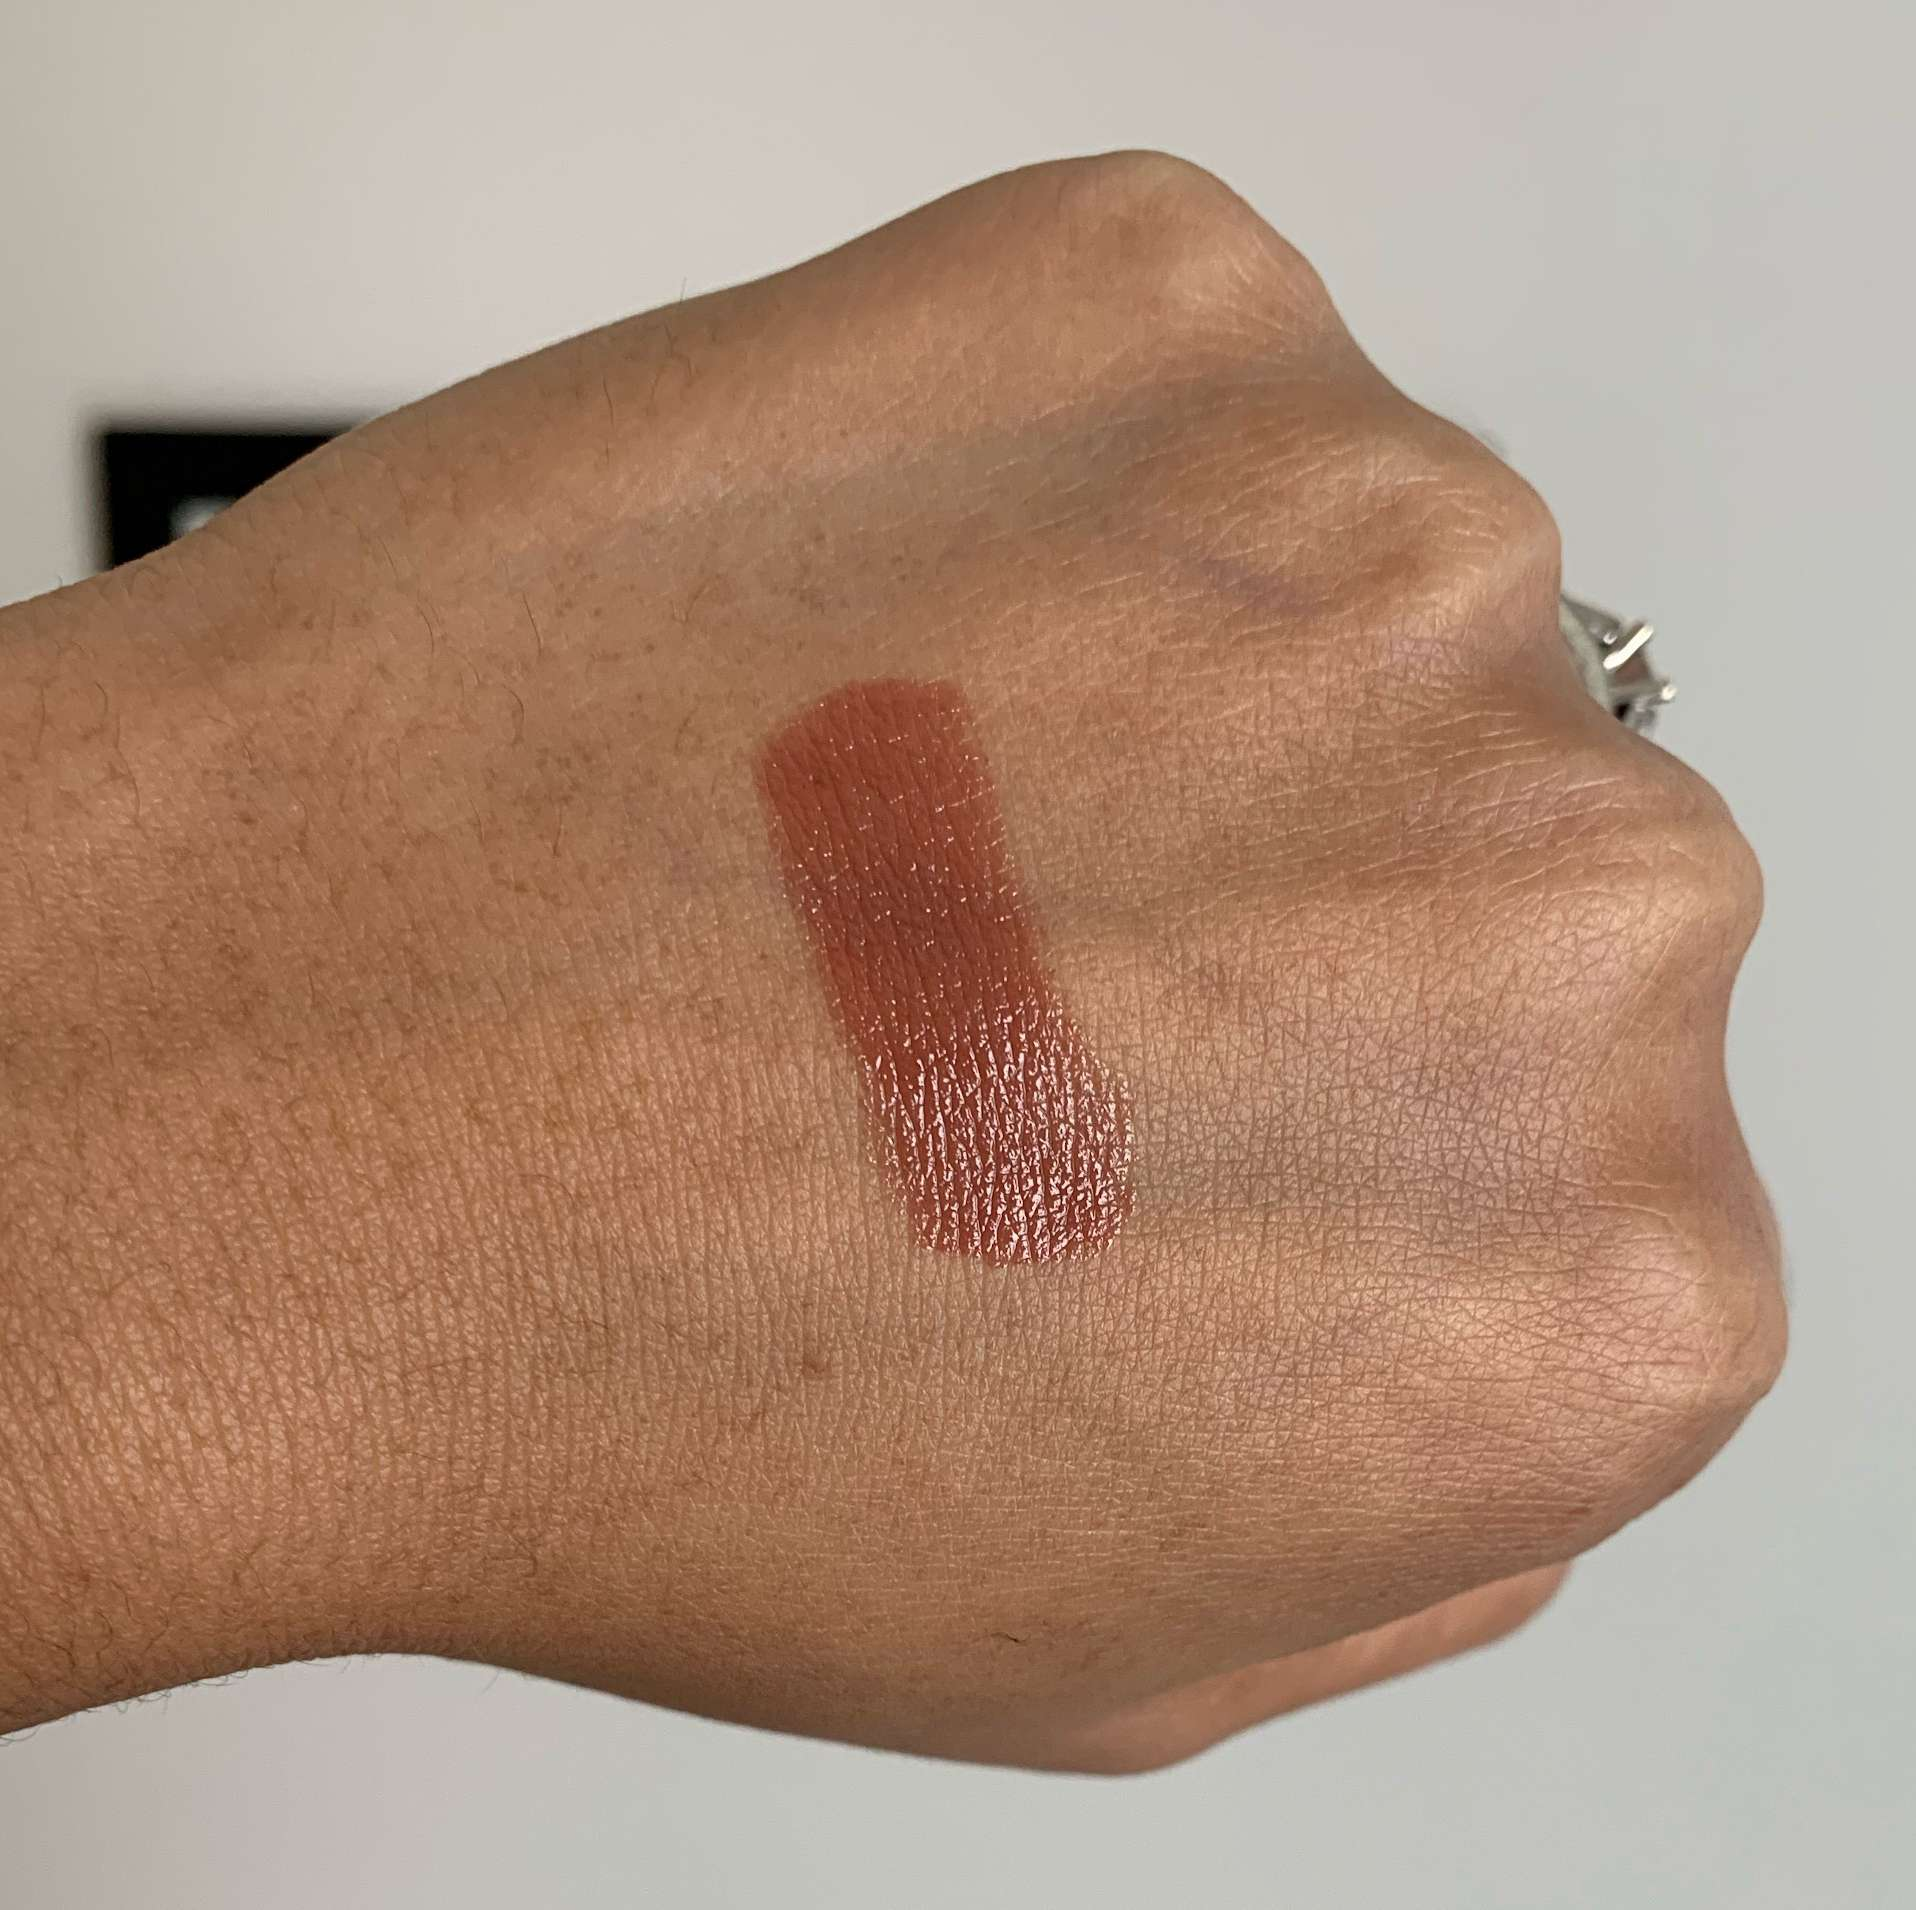 Huda Beauty Money Maker Power Bullet Cream Glow Hydrating Lipstick Money Maker Swatch on Medium Dark Skin